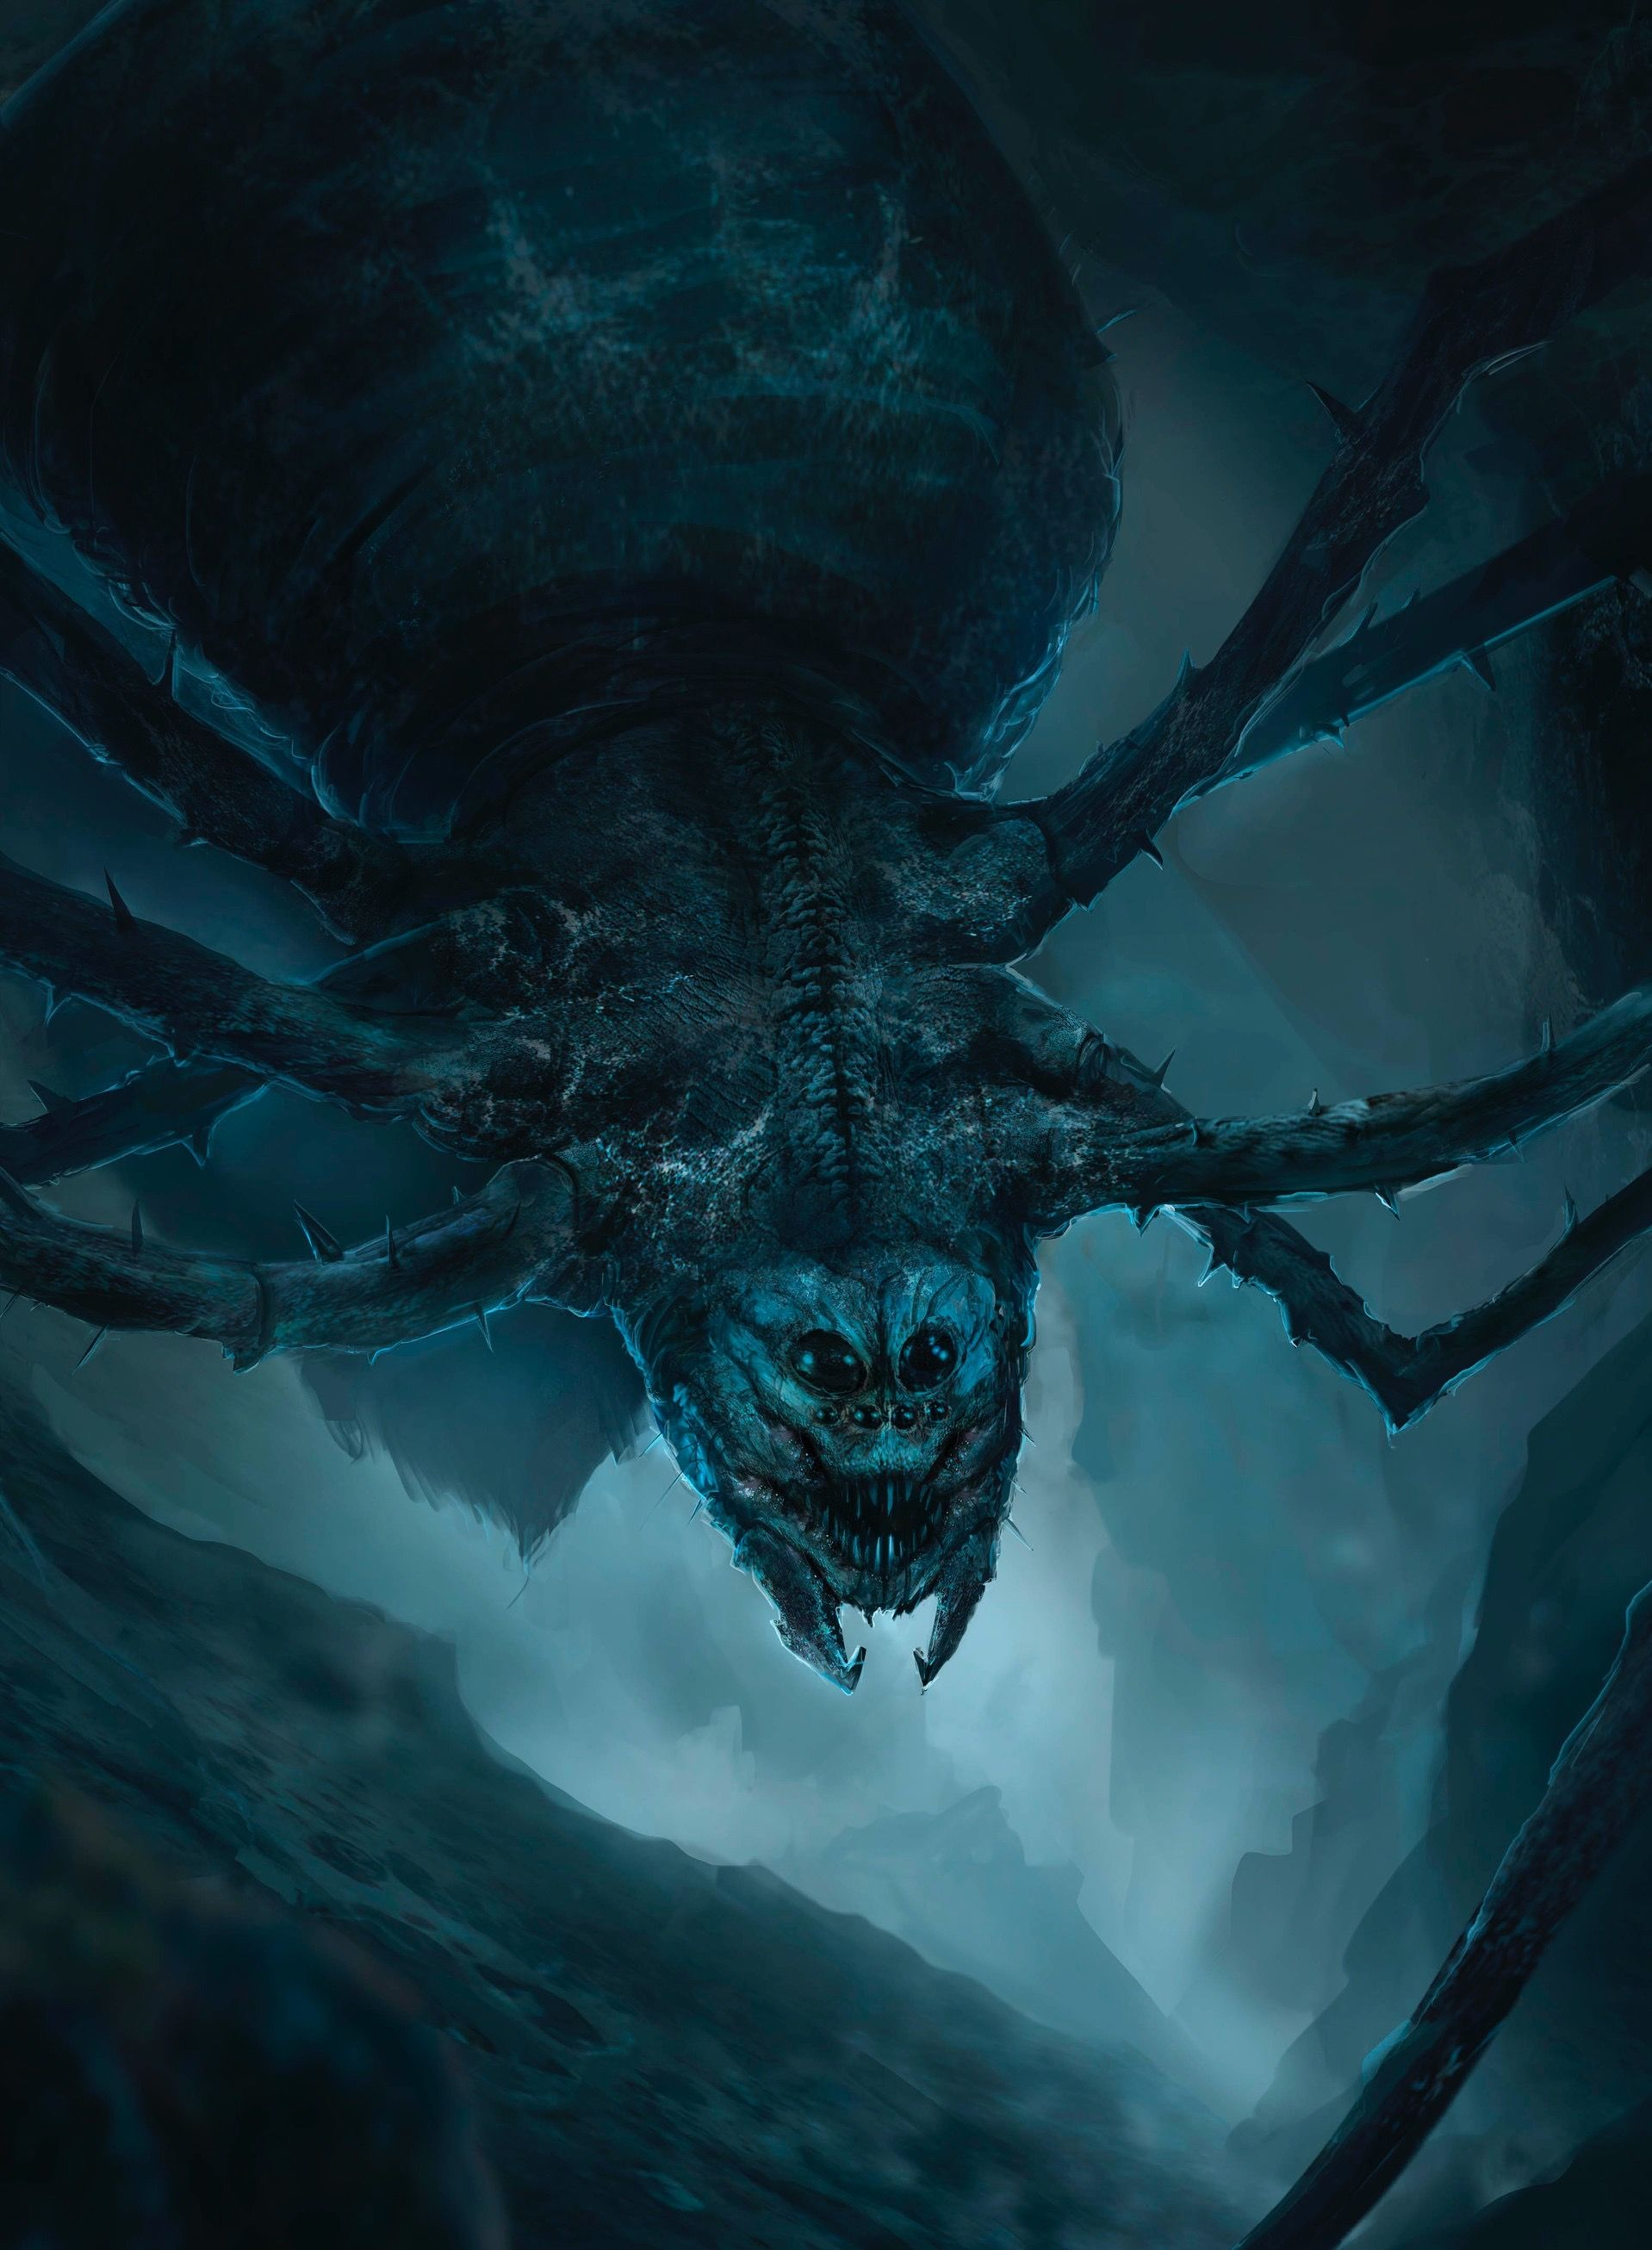 Ungoliant | Tolkien, Tolkien art, Middle earth